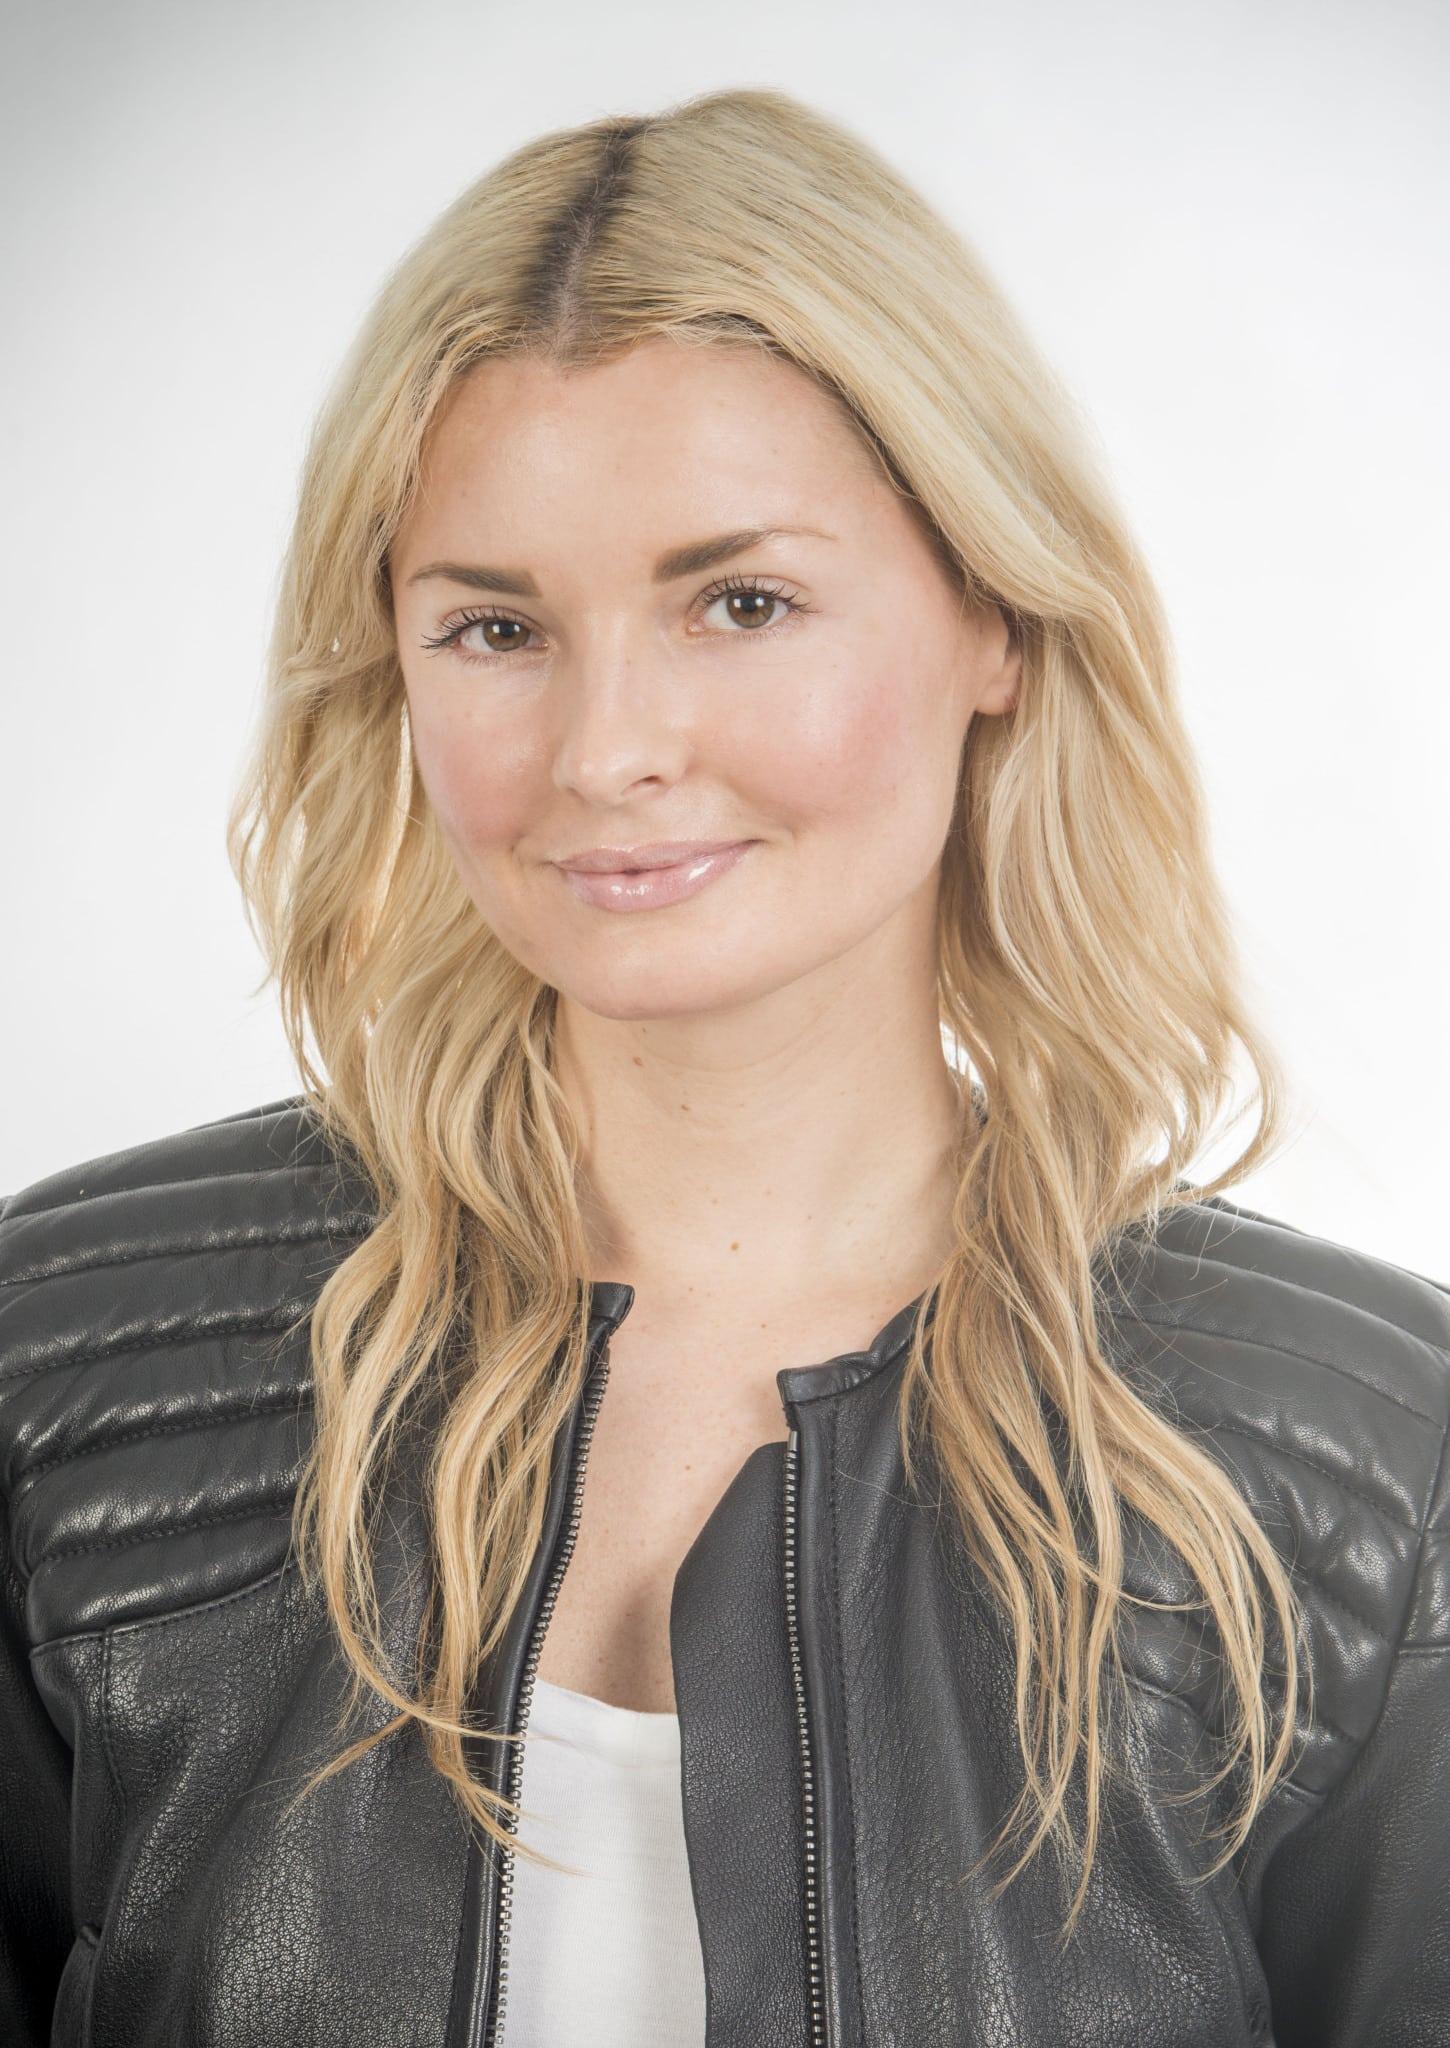 Jessica Teves